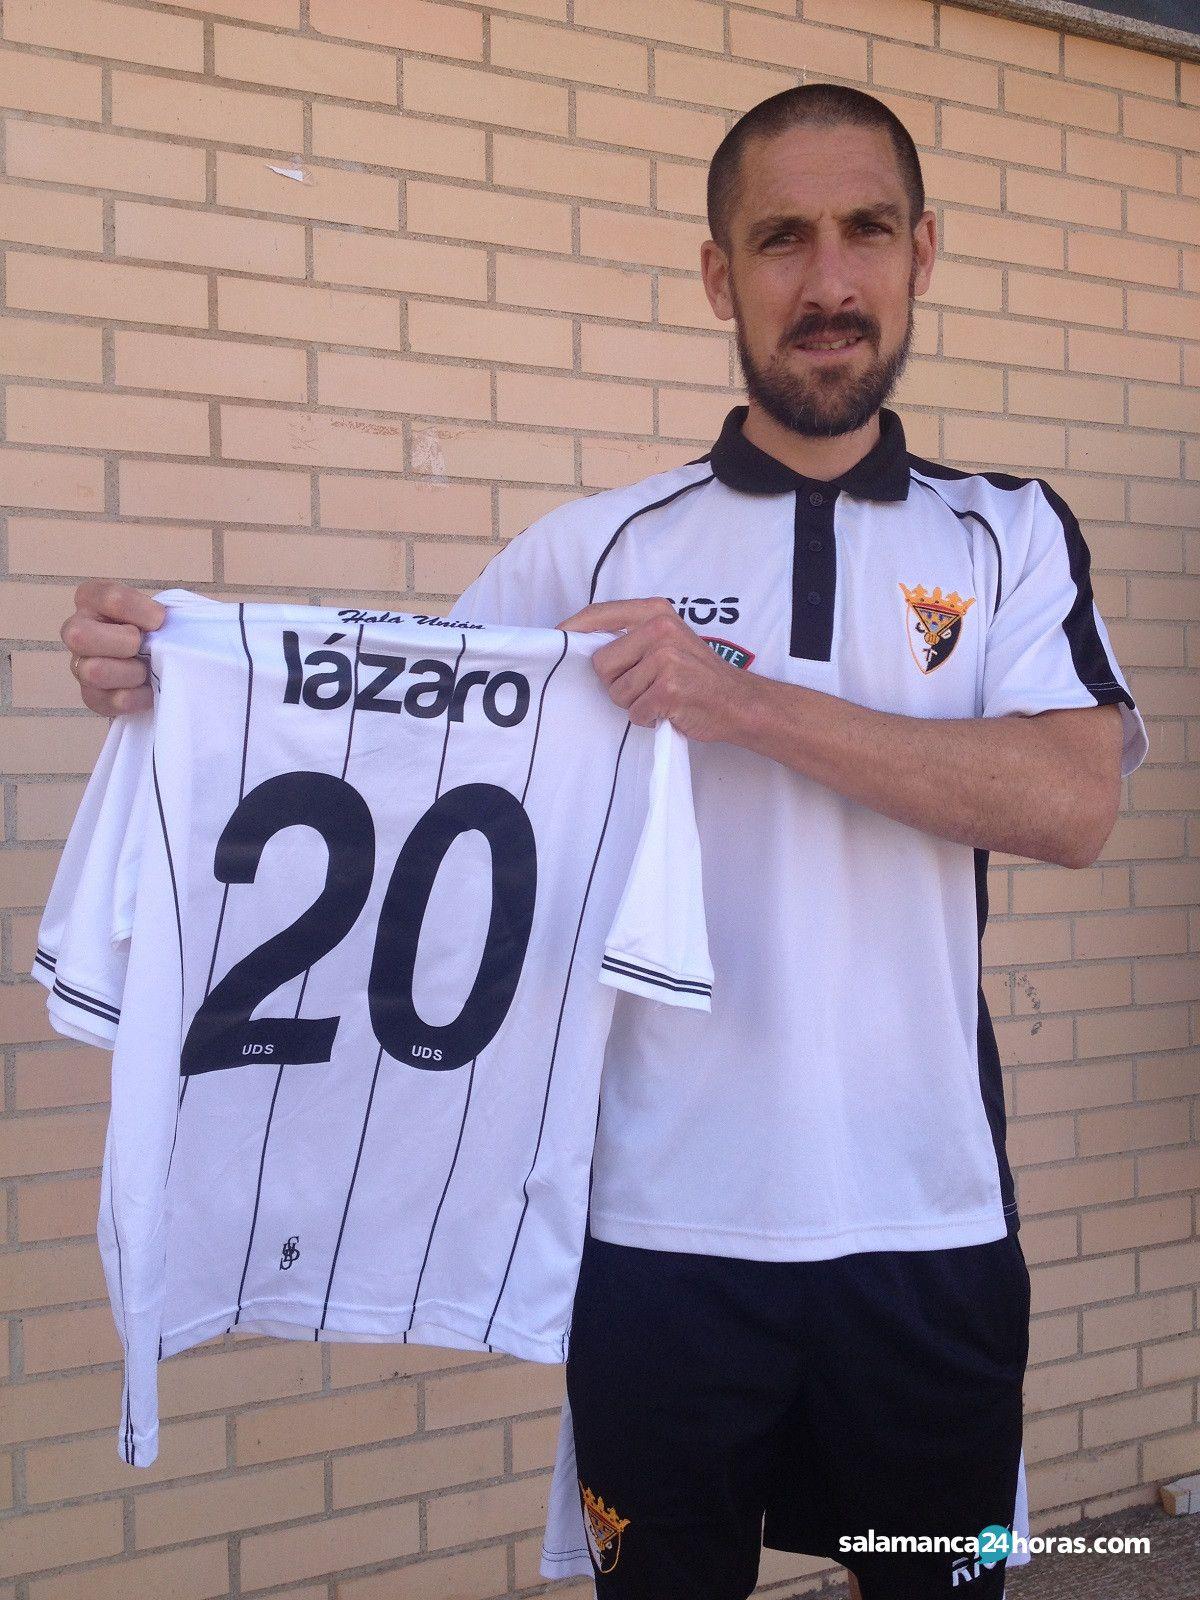 David Lázaro Tudelano (11)